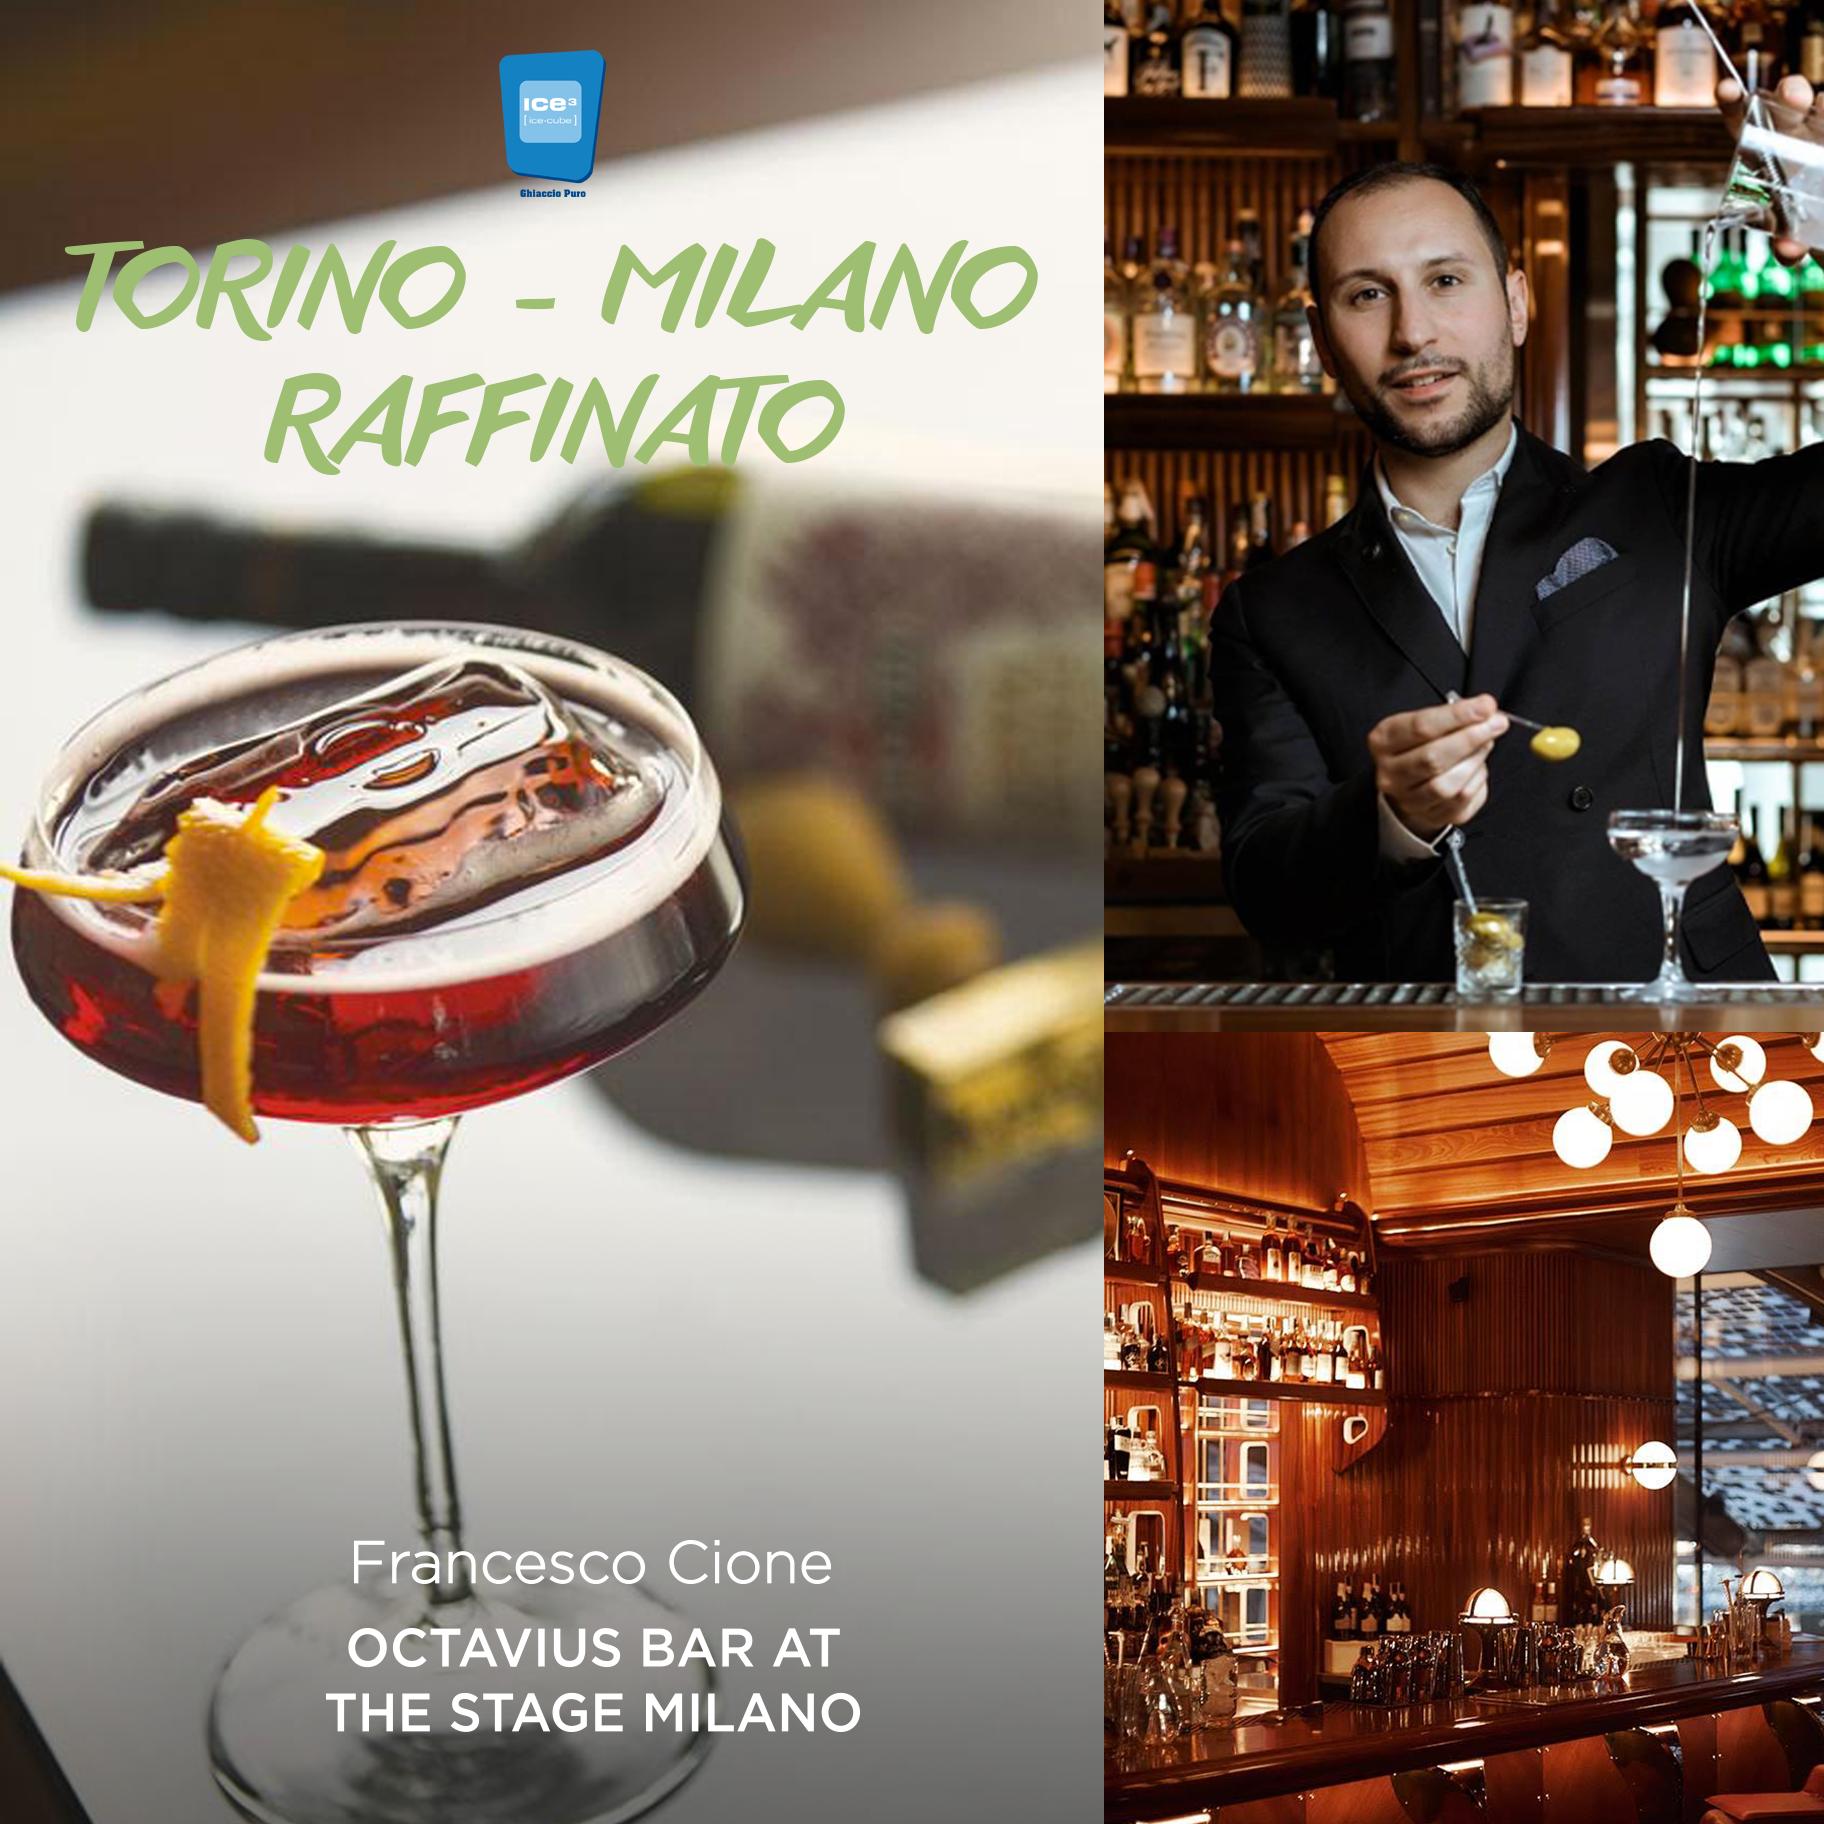 cocktail_milano_torino-milano